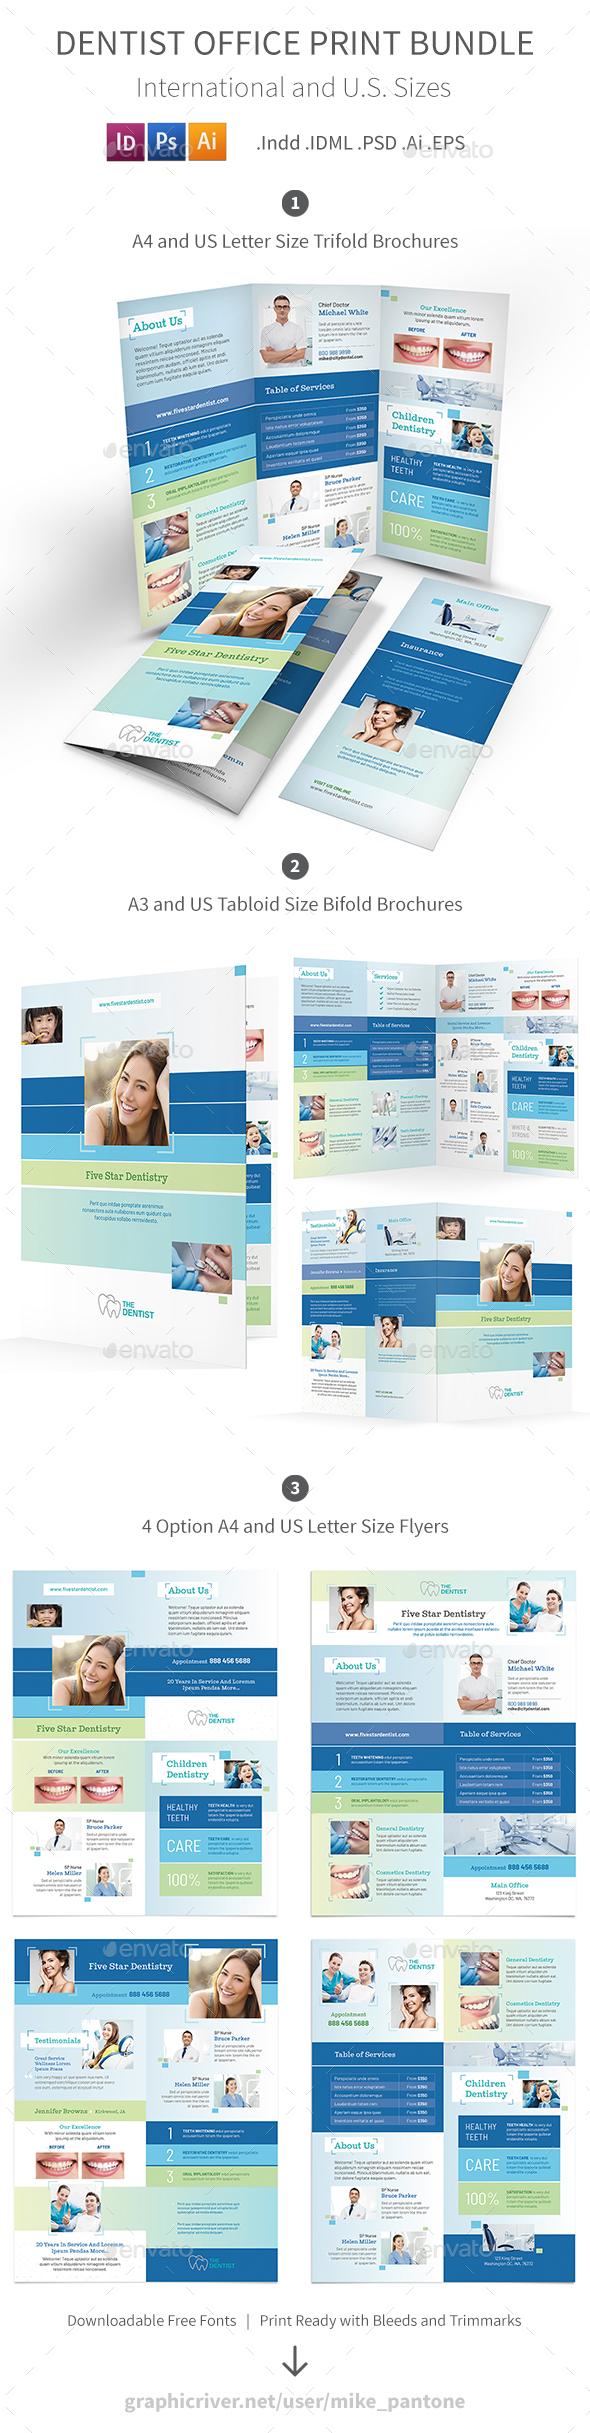 Dentist Office Print Bundle 5 - Informational Brochures